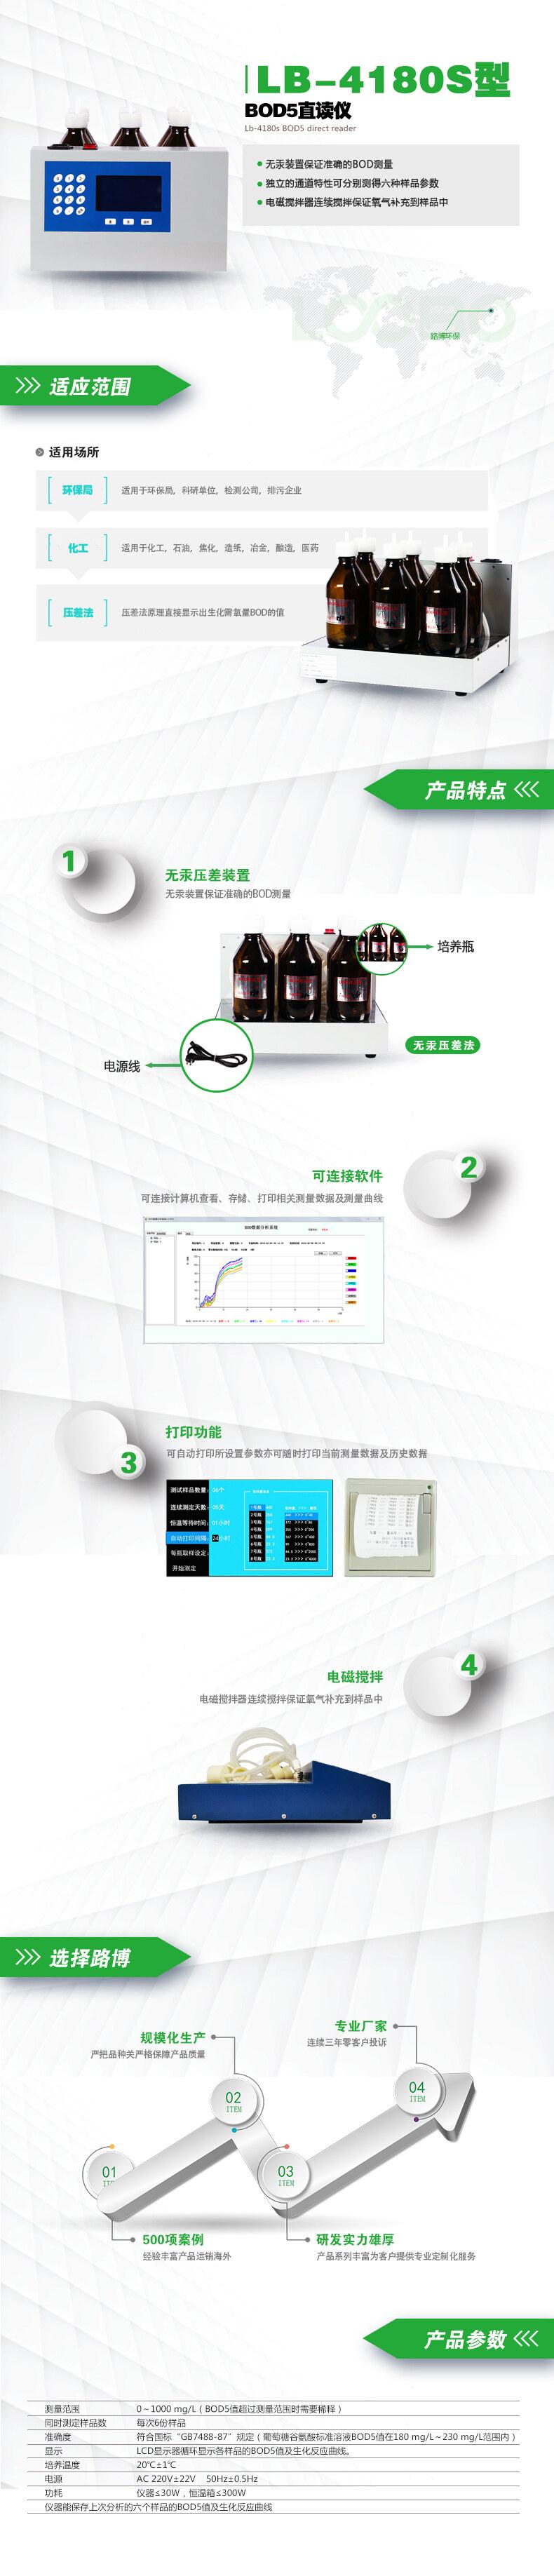 LB-R80(S)(S)-BOD5測定儀.jpg